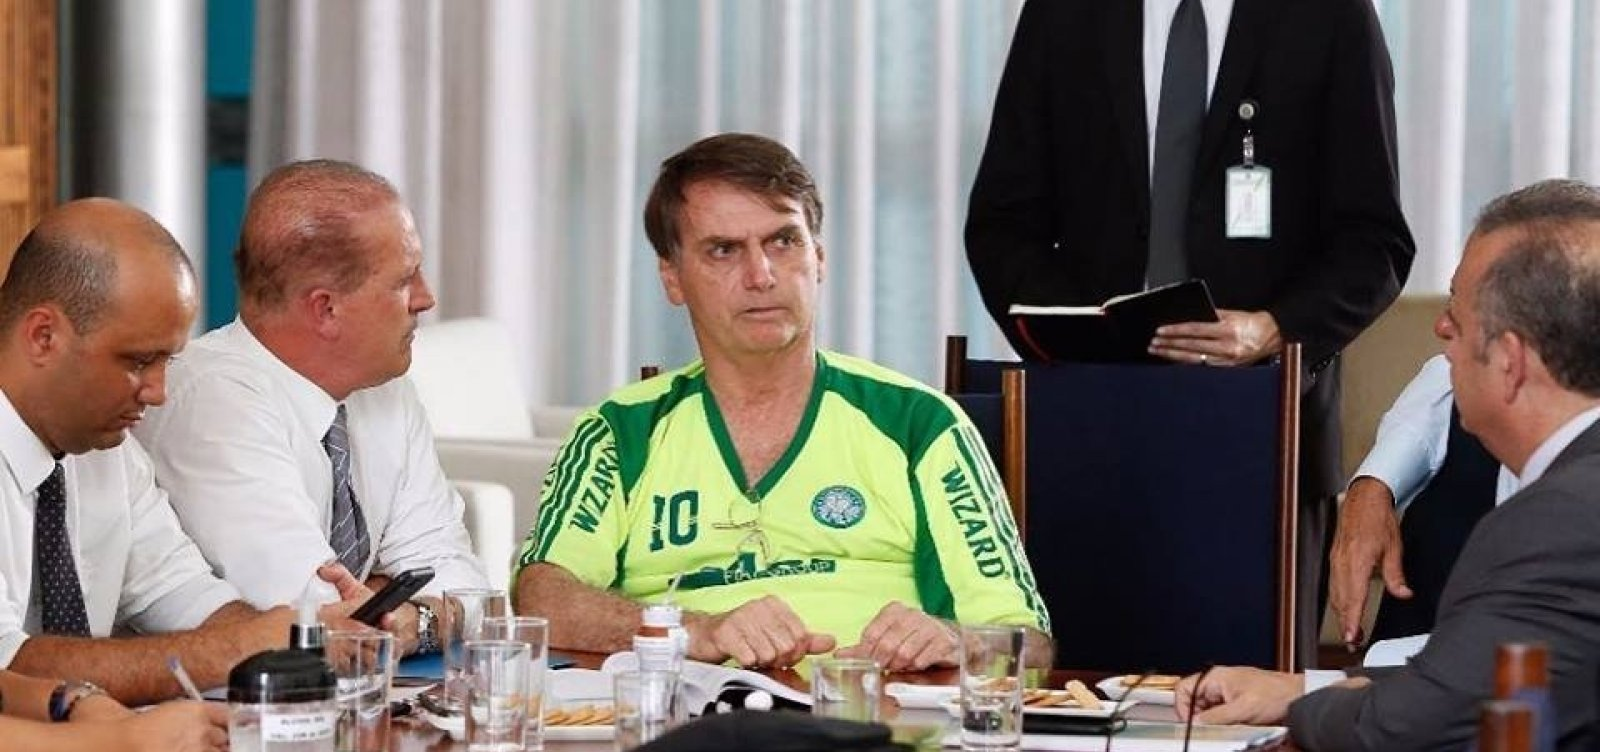 Governo Bolsonaro estuda proibir uso de jeans por servidores e visitantes